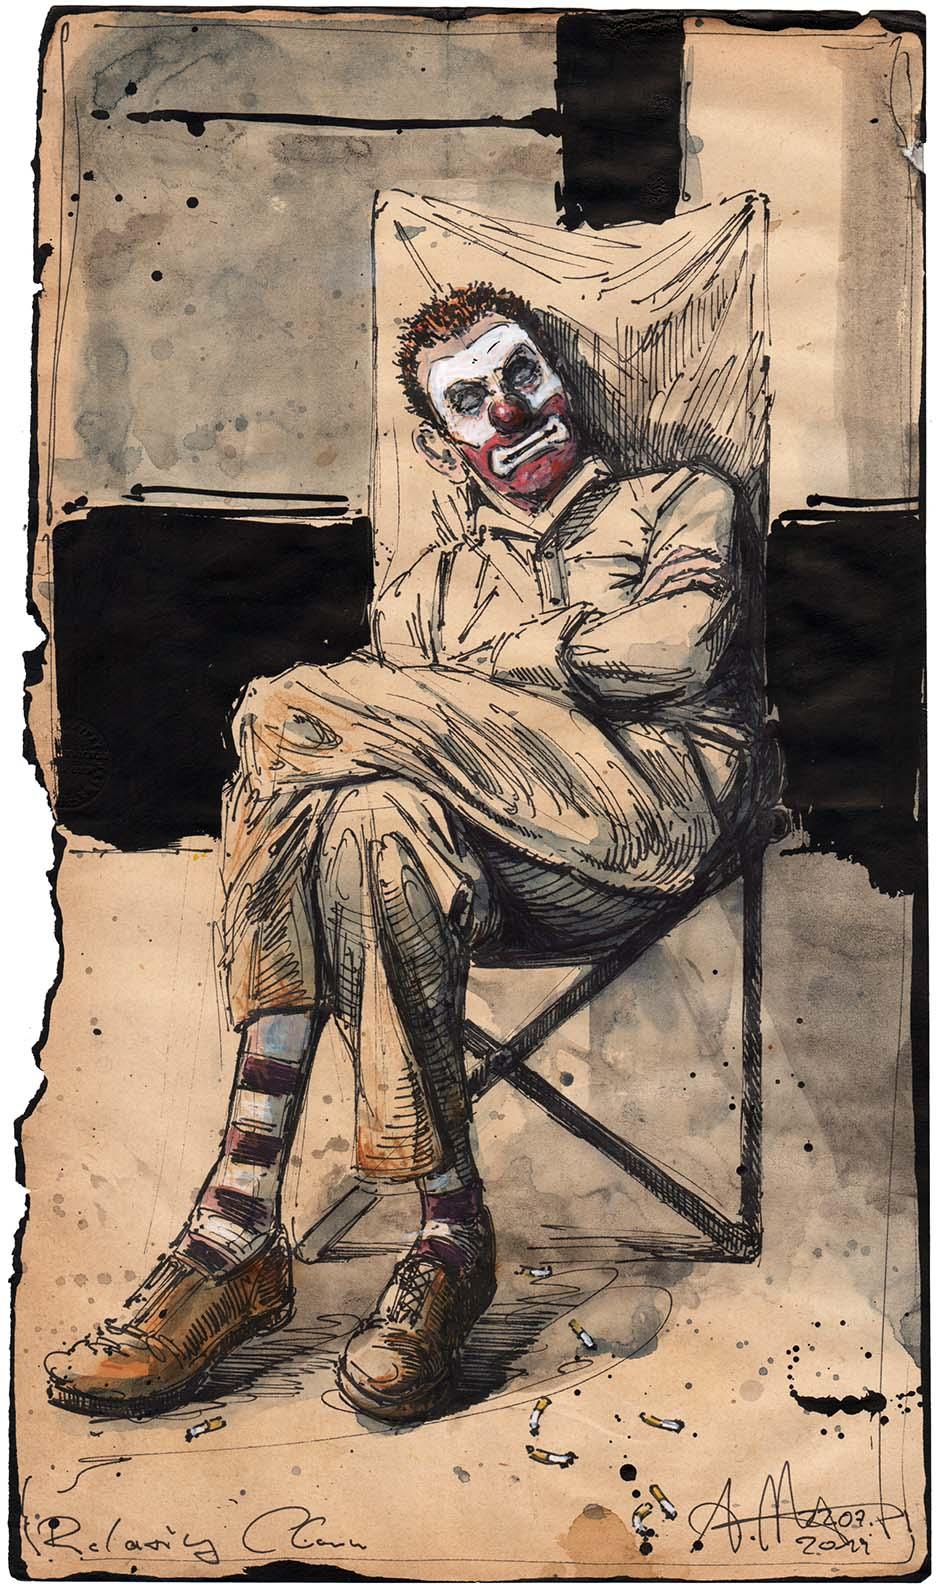 Relaxing Clown